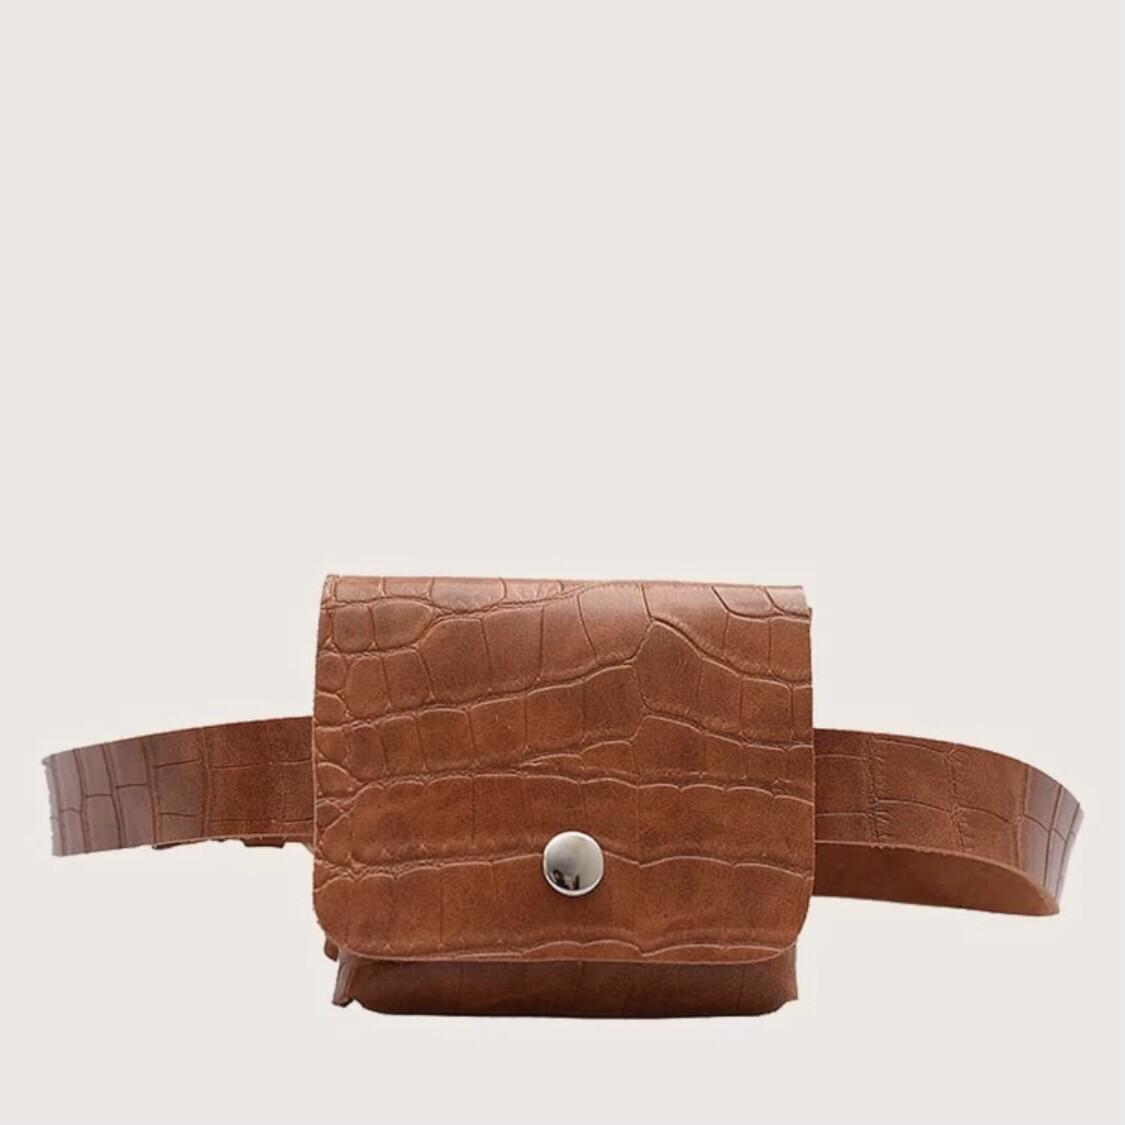 Croco Tan Waist Belt Bag